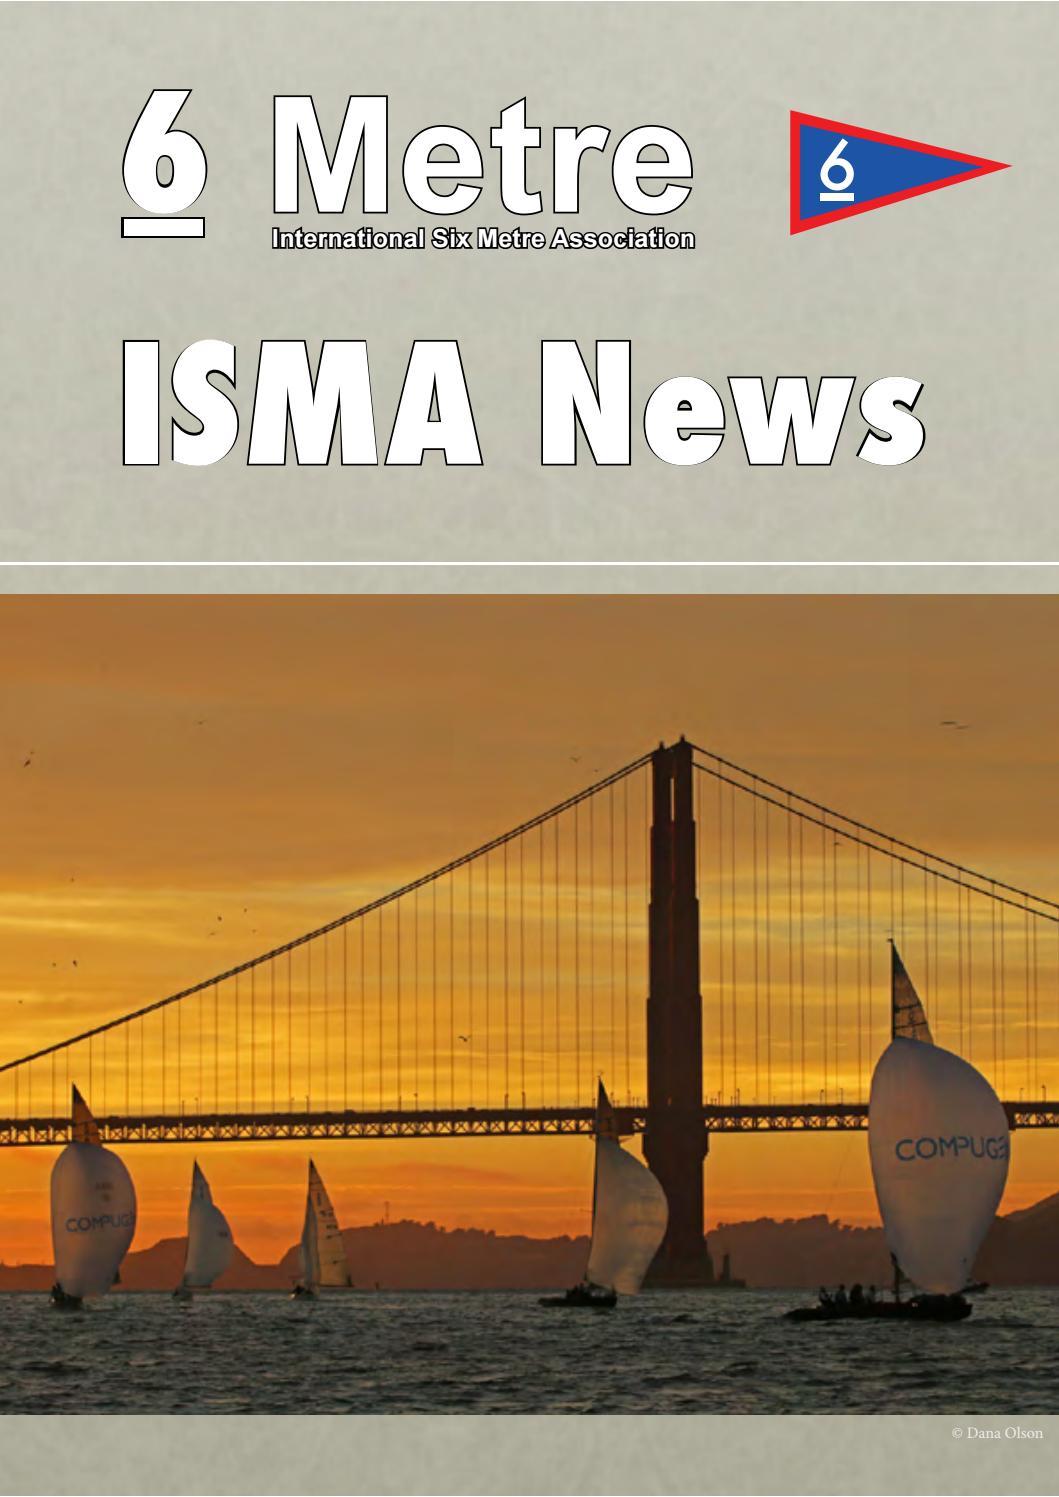 ISMA News 20152016 by International 6mJI